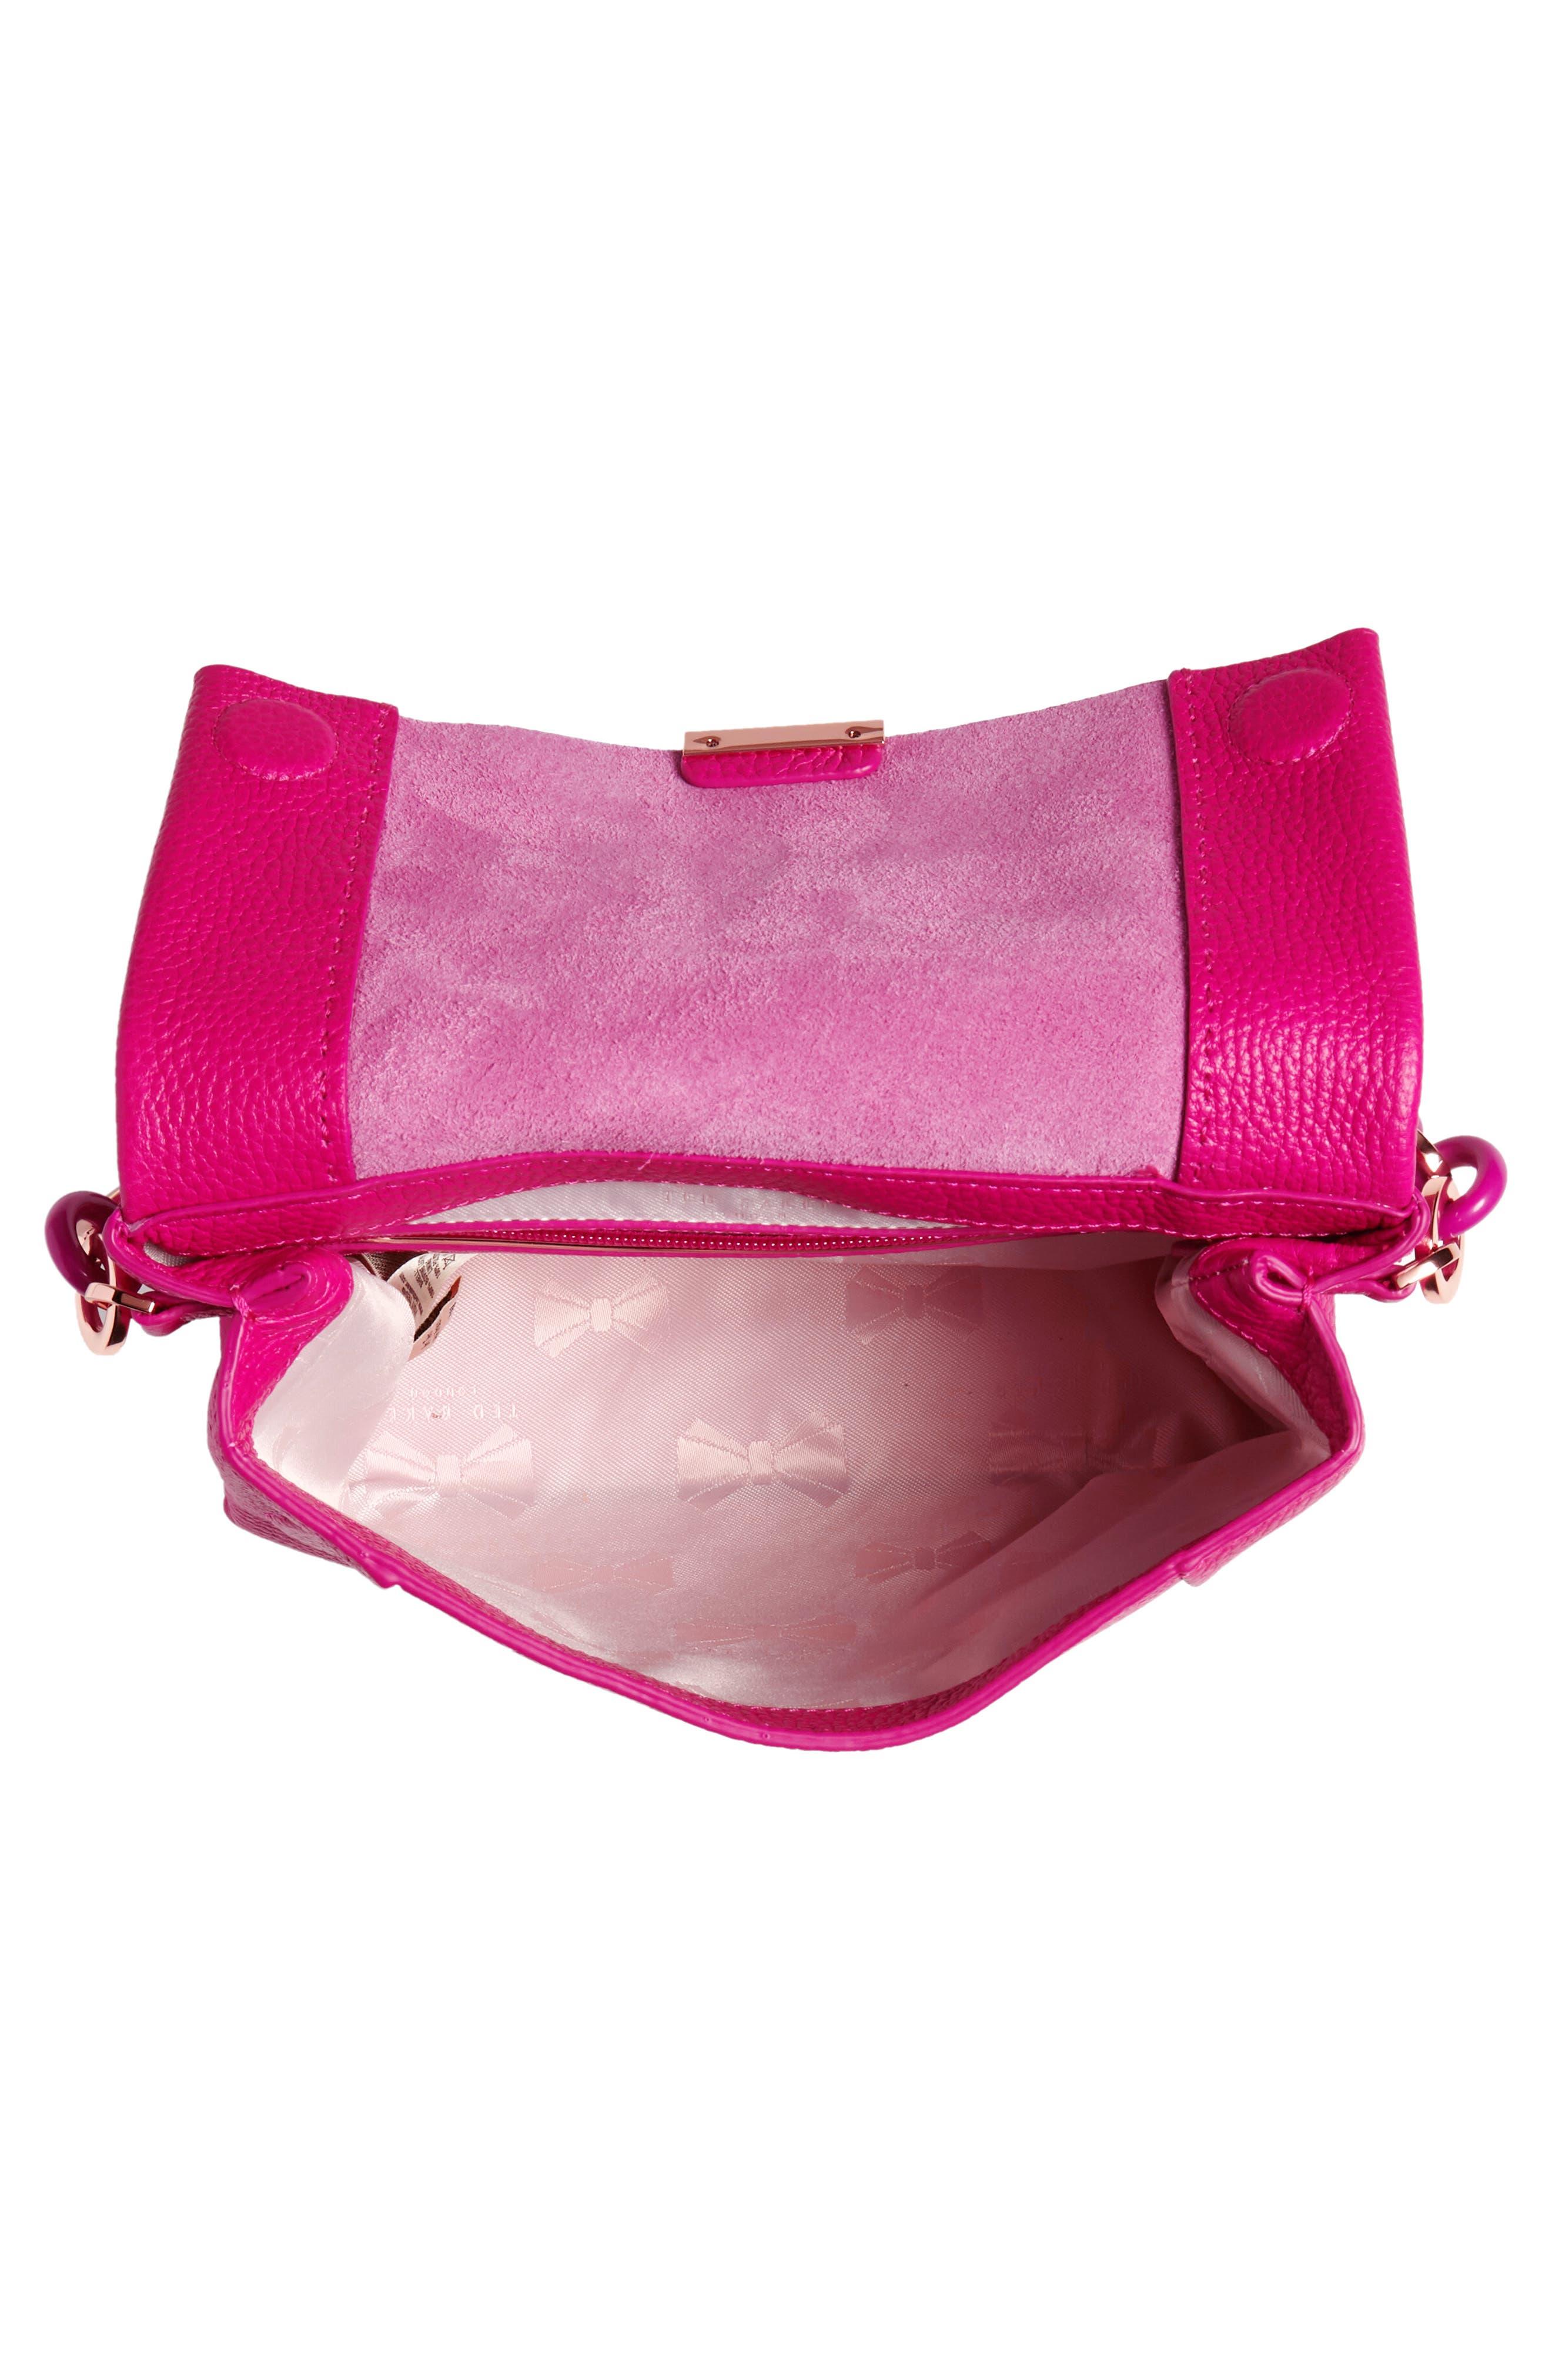 Ipomoea Leather Shoulder Bag,                             Alternate thumbnail 12, color,